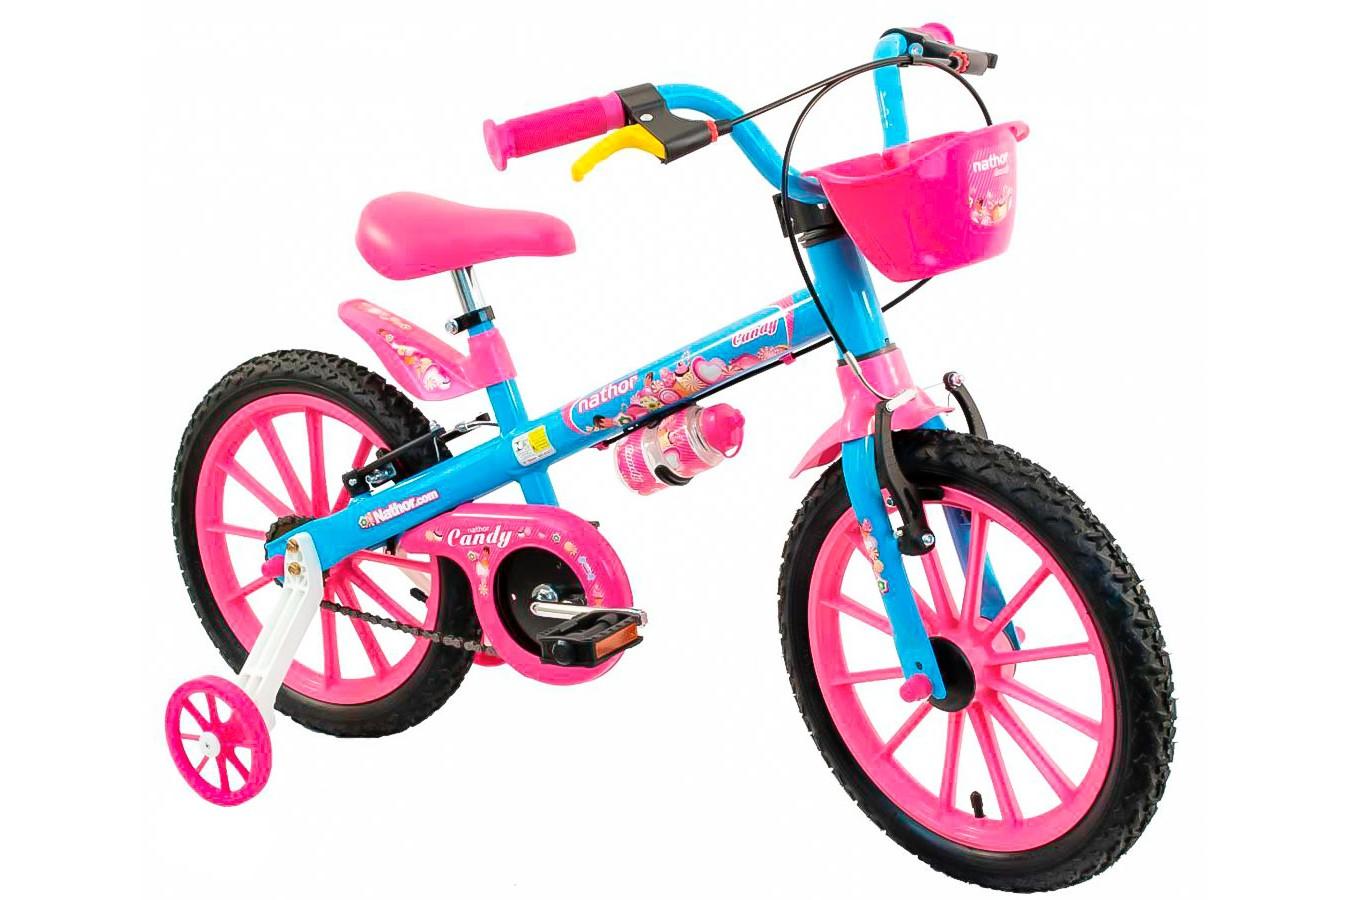 Bicicleta aro 16 Feminina Candy - Nathor